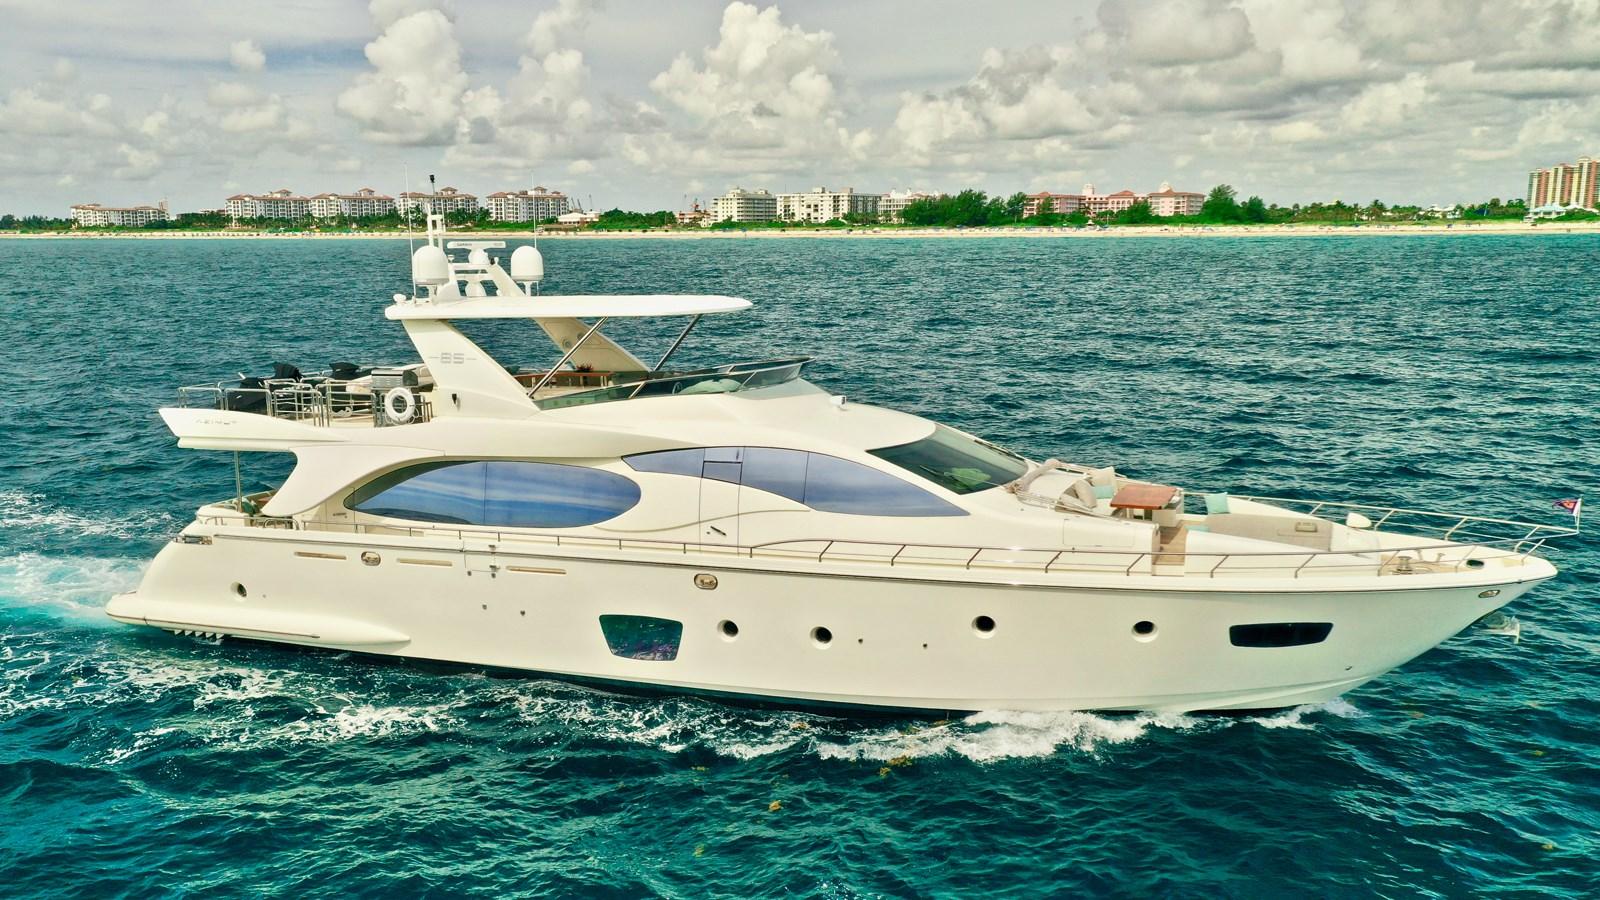 2009 85 Azimut Flybridge - YB Profile 2009 AZIMUT 85 Flybridge Motor Yacht 2649139